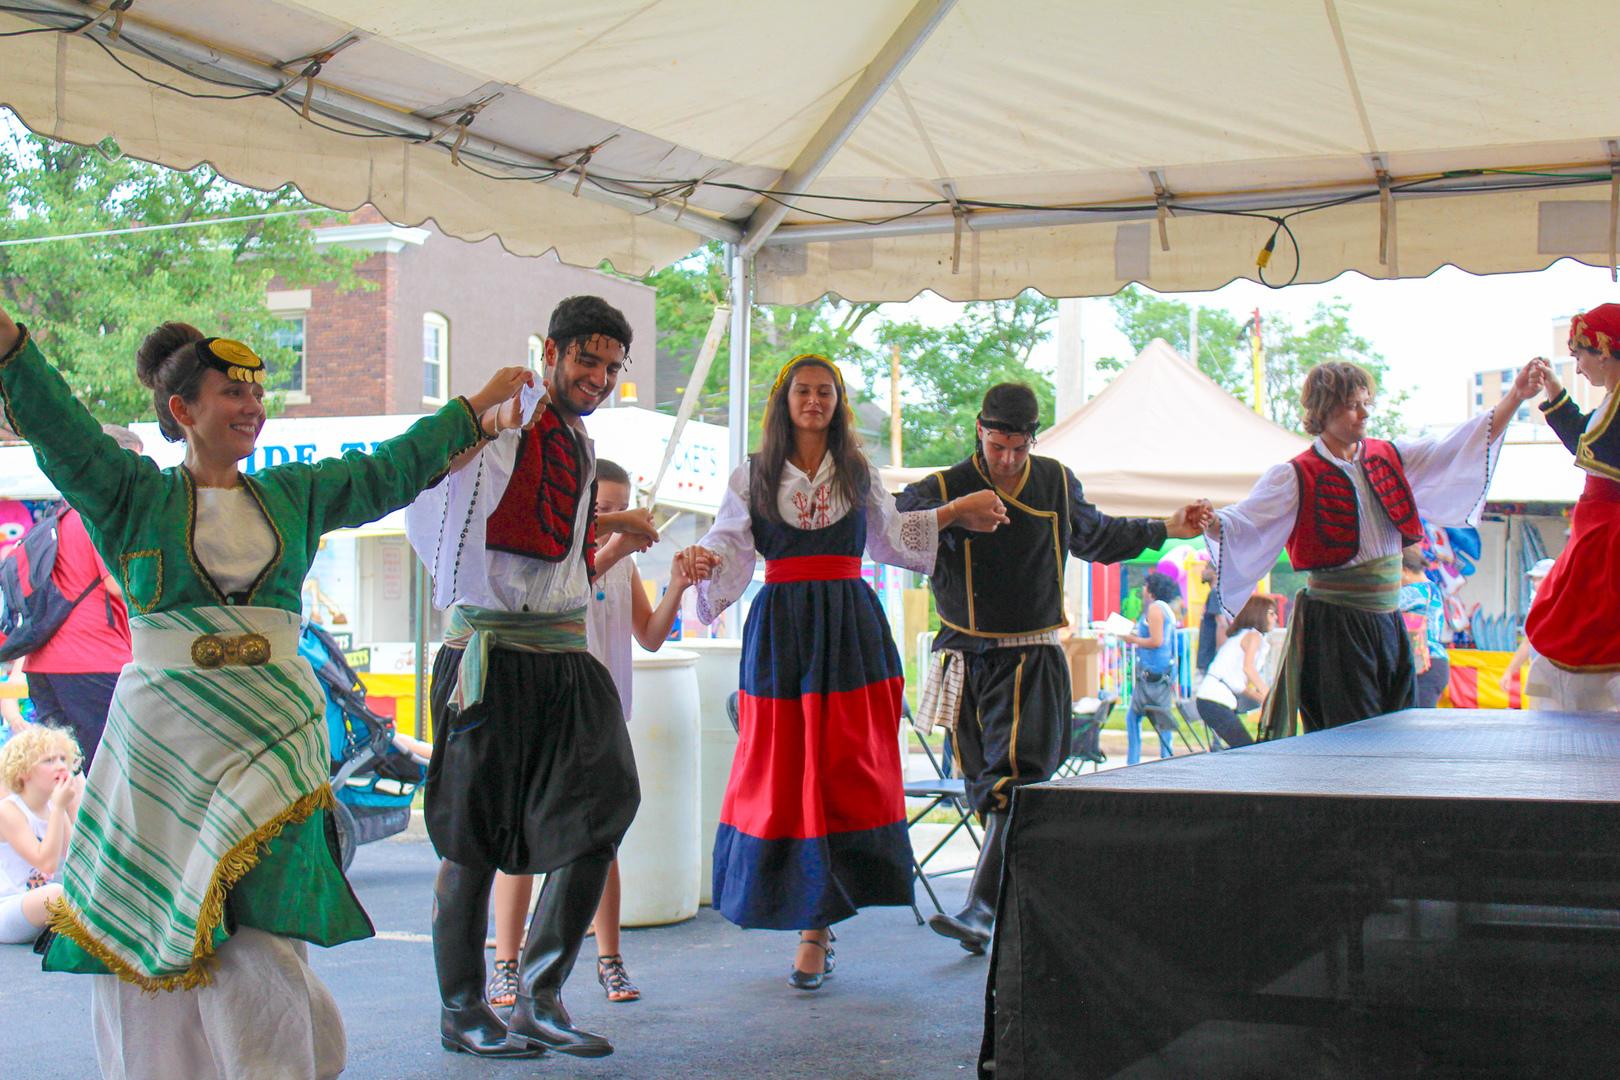 Omaha's Original Greek Festival - Omaha's Original Greek Festival